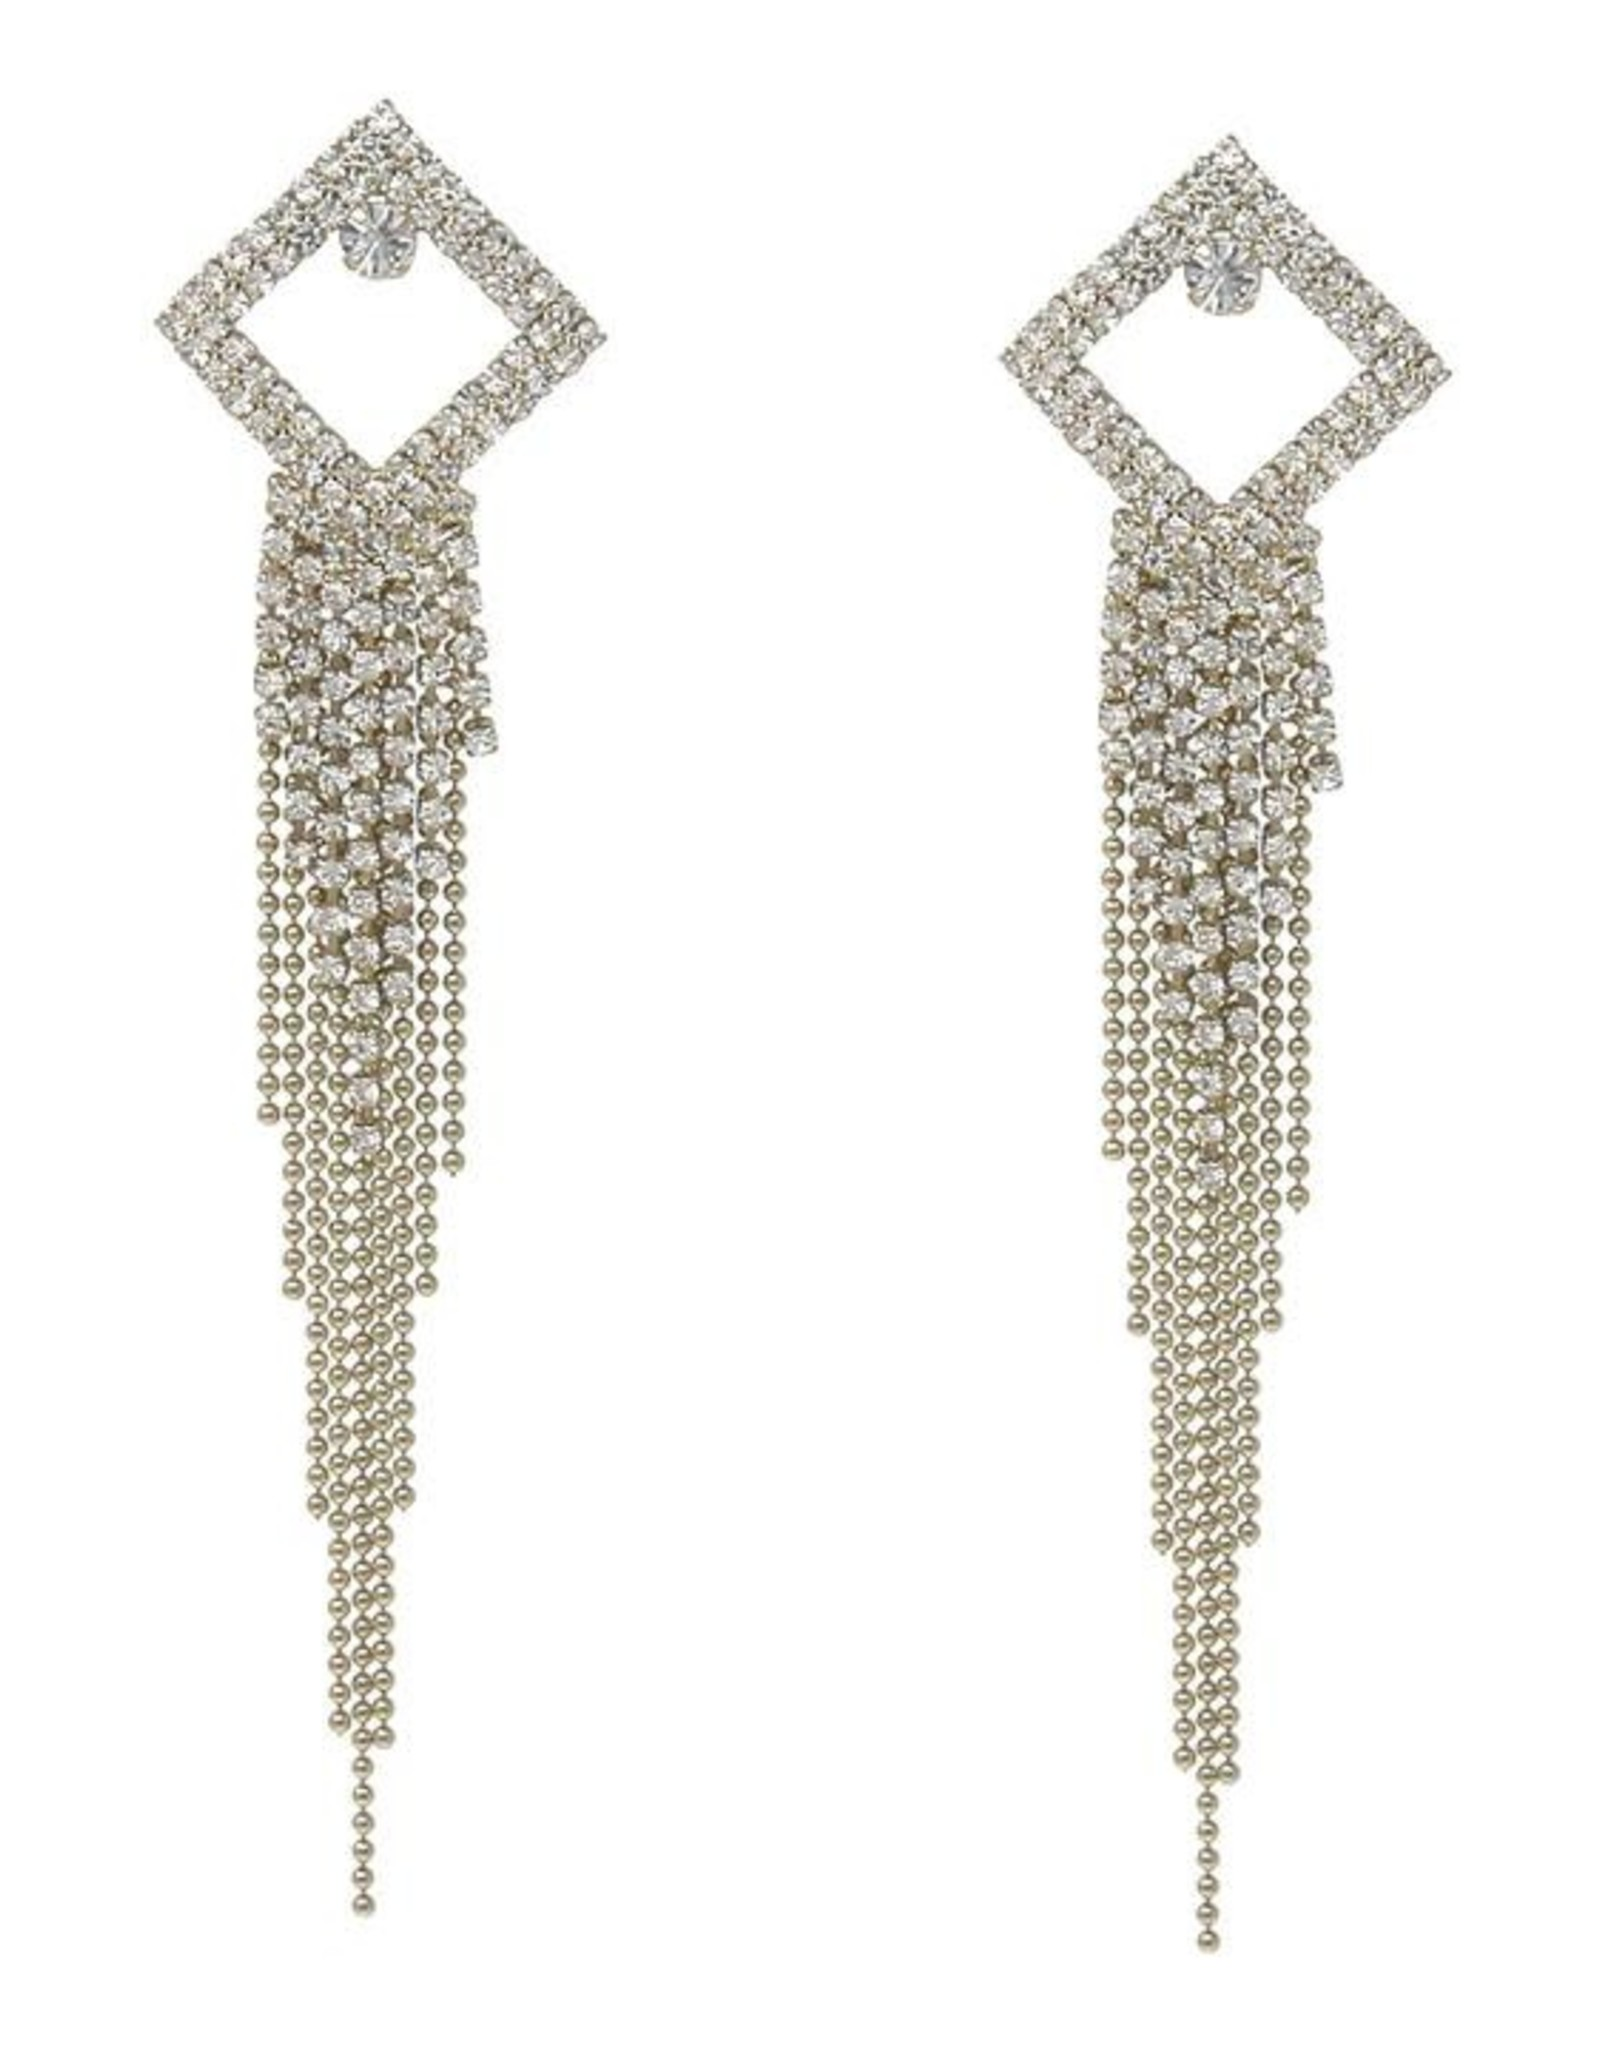 Rhinestone Pave Square Ball Chain Fringe Drop Earrings - Gold